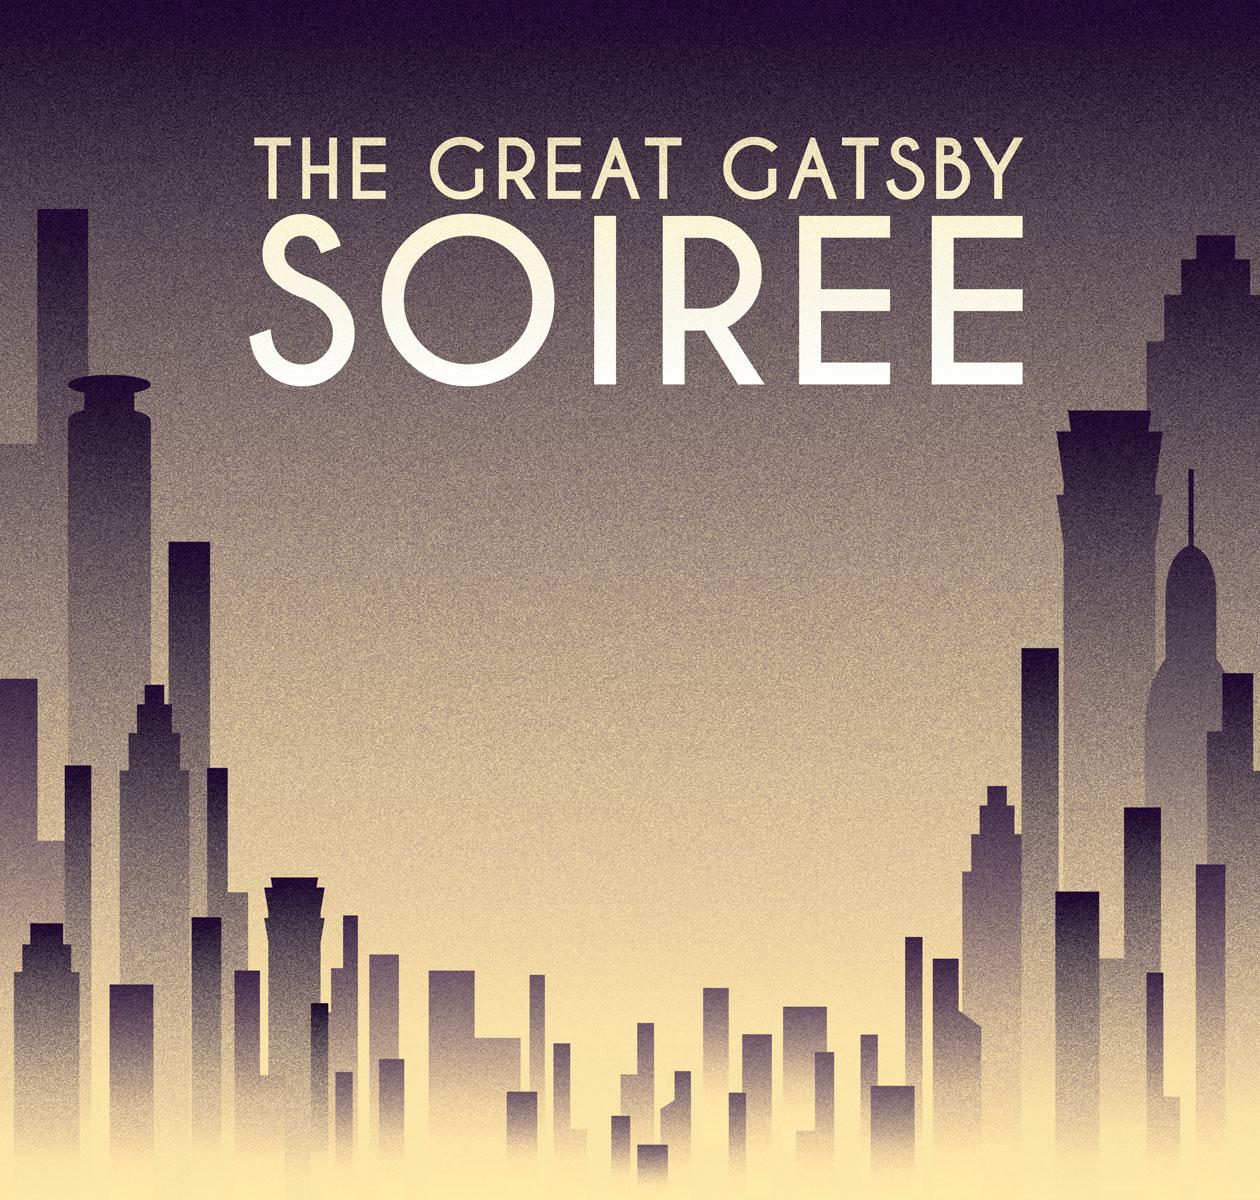 Gatsby-Soiree-backdrop1260x1200.jpg